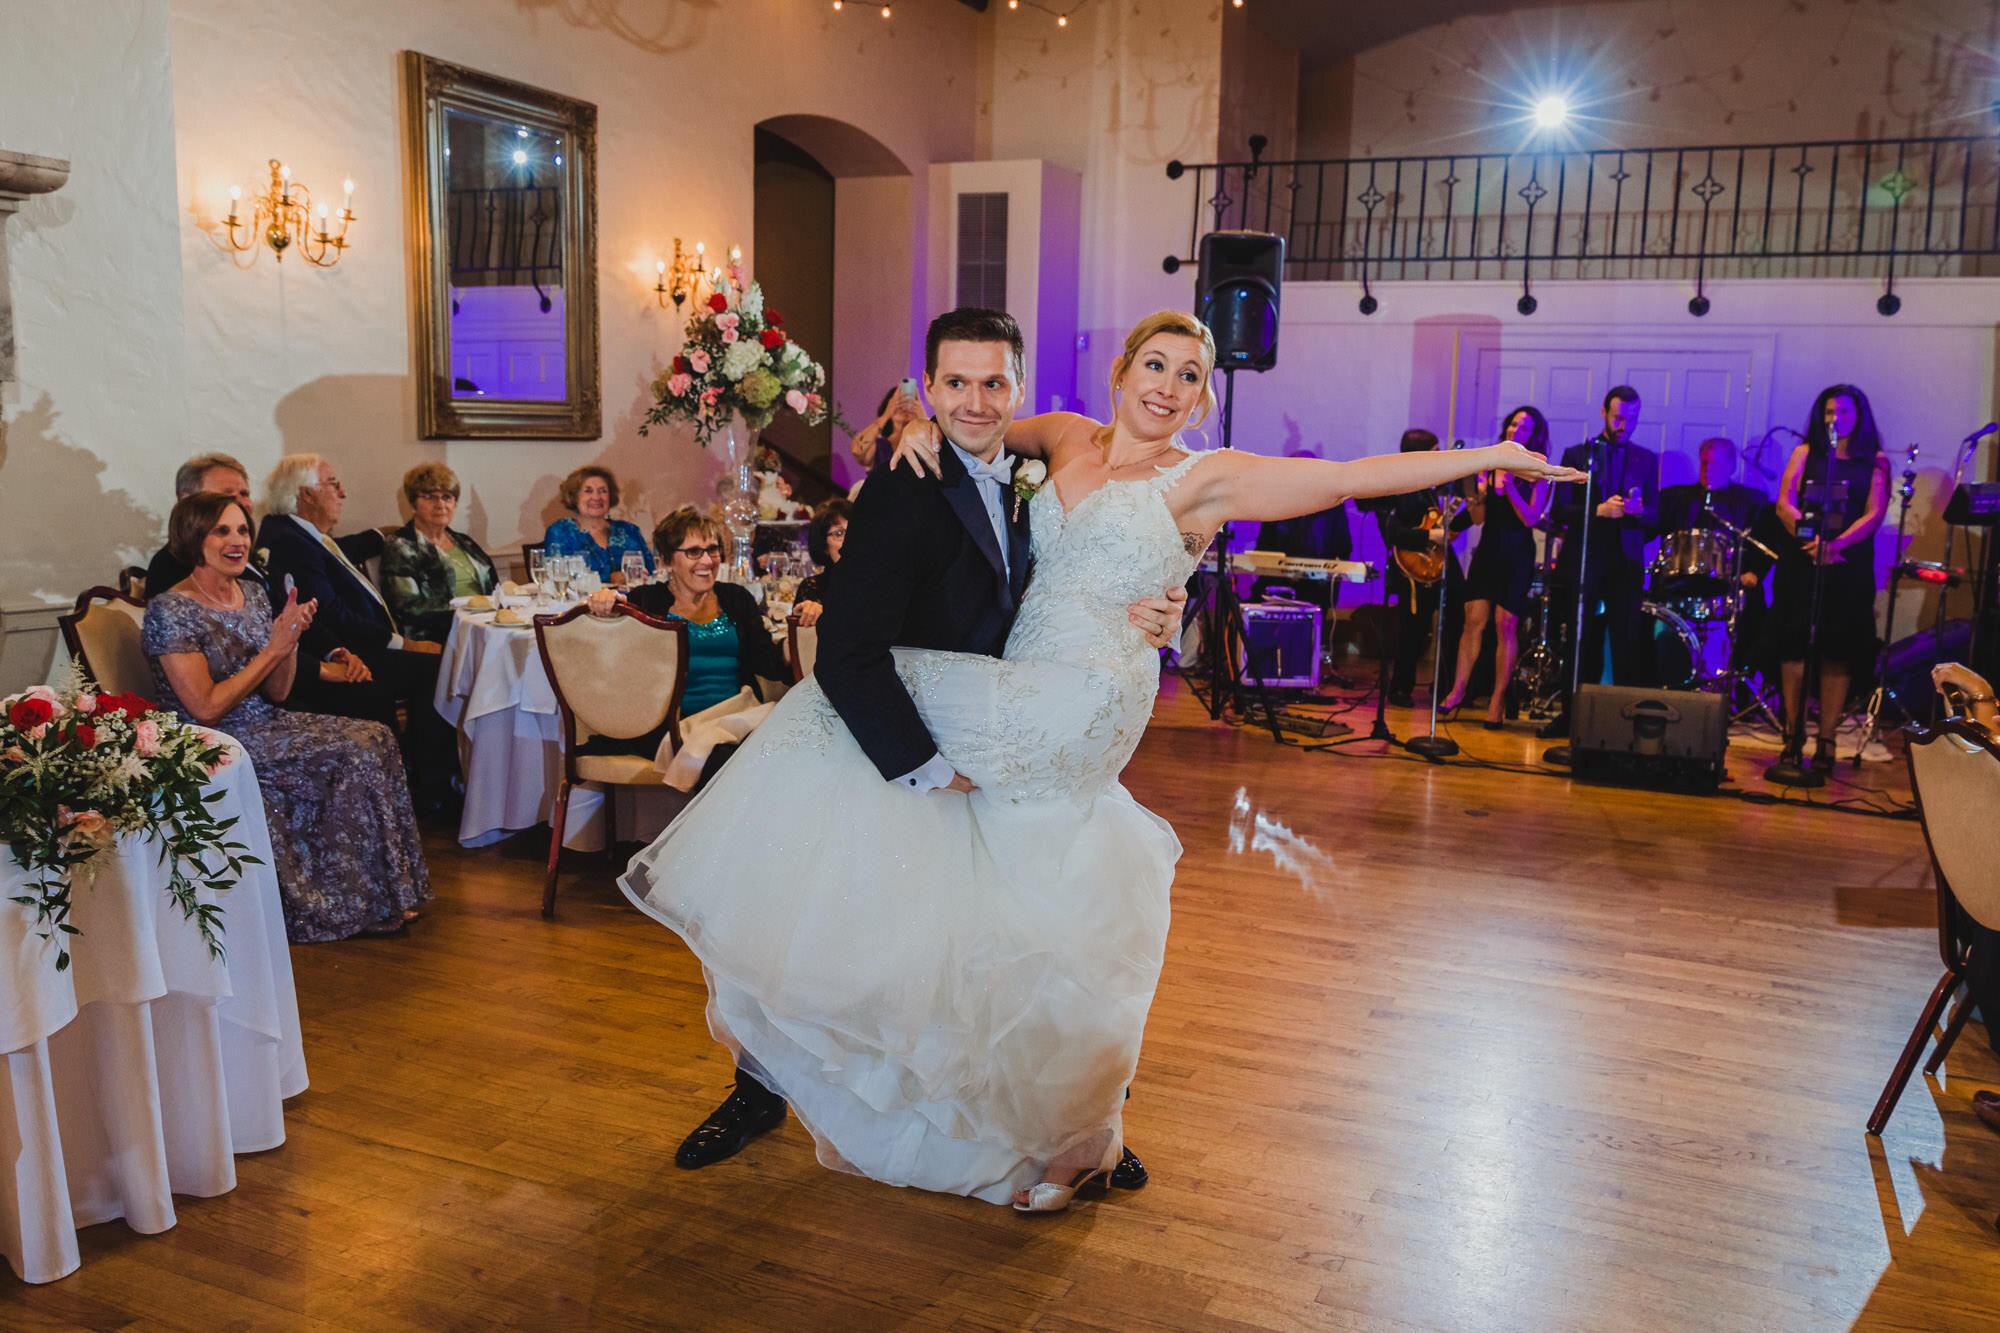 Christina & Dan Wedding at Huntingdon Valley Country Club 00020.JPG